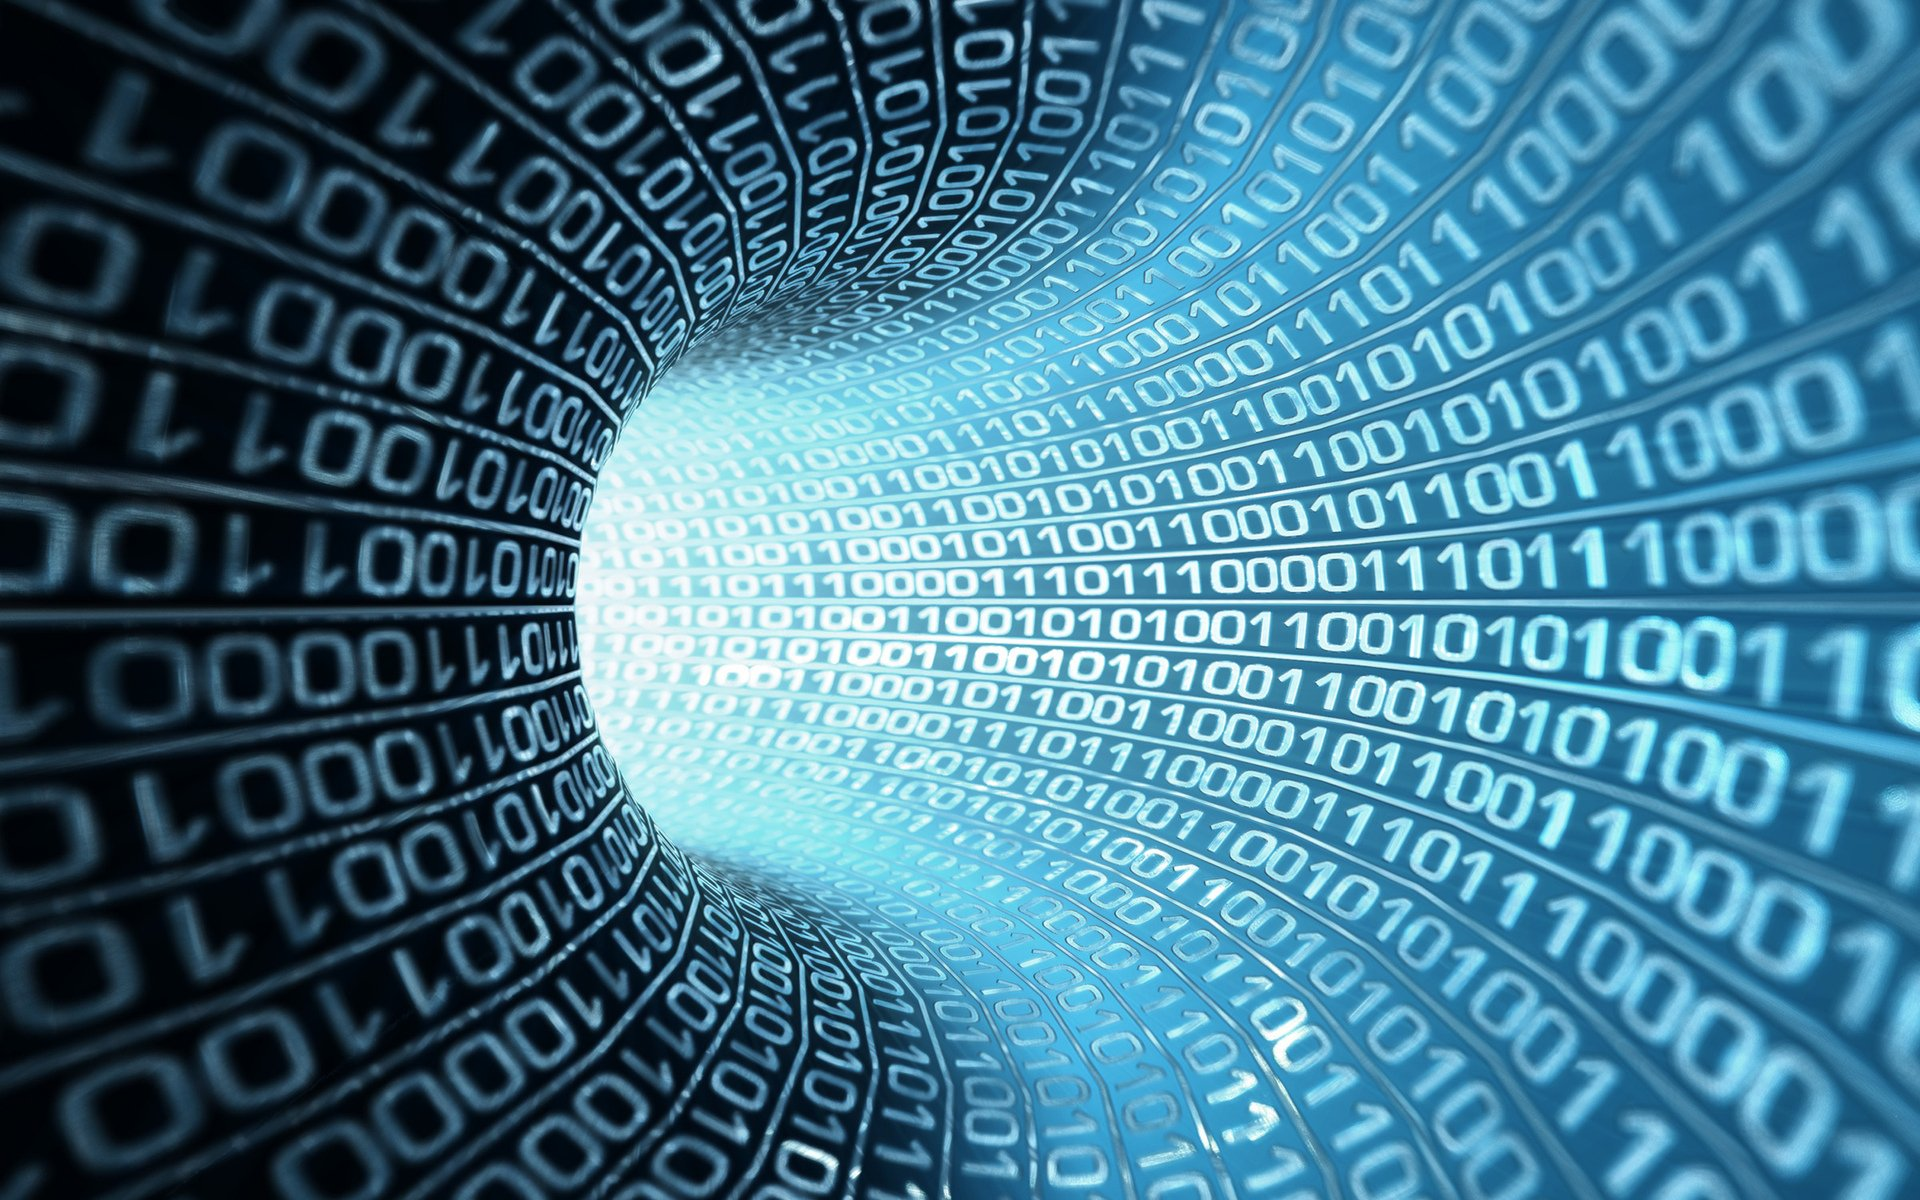 pipe-tunnel-network-numbers-binary-code-one-zero.jpg